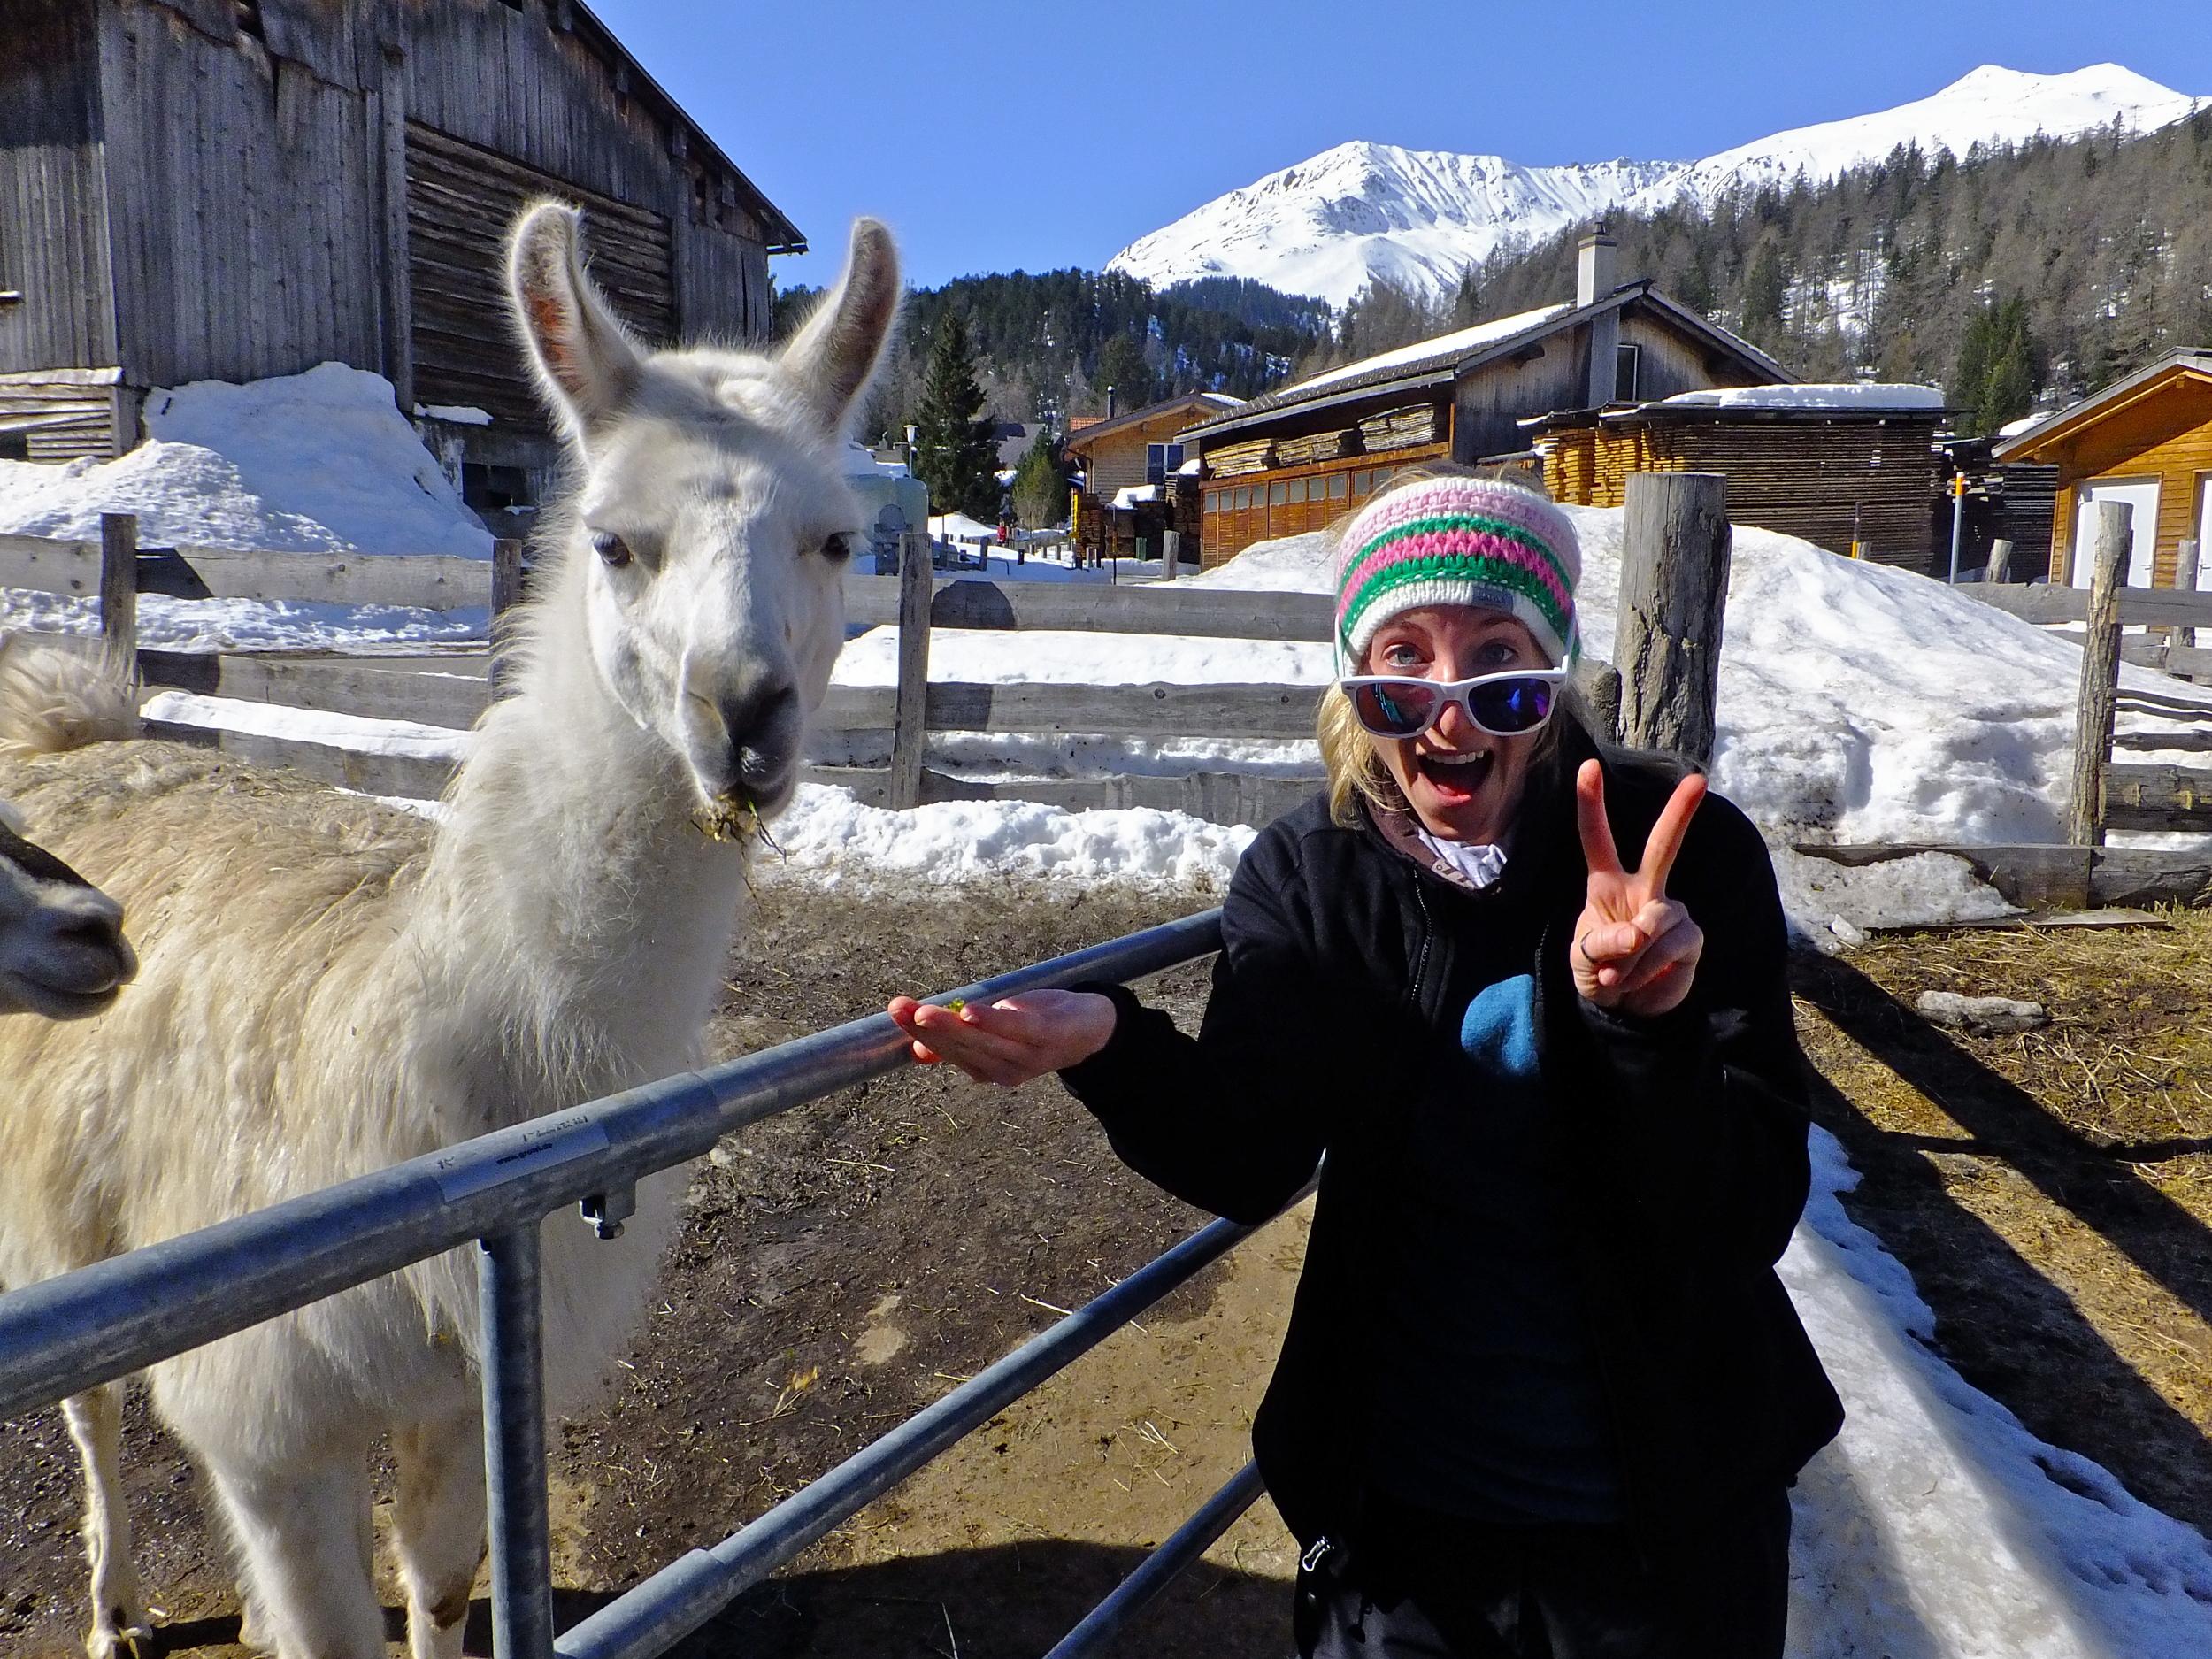 Saskia's friend is jealous of her icefield adventures!